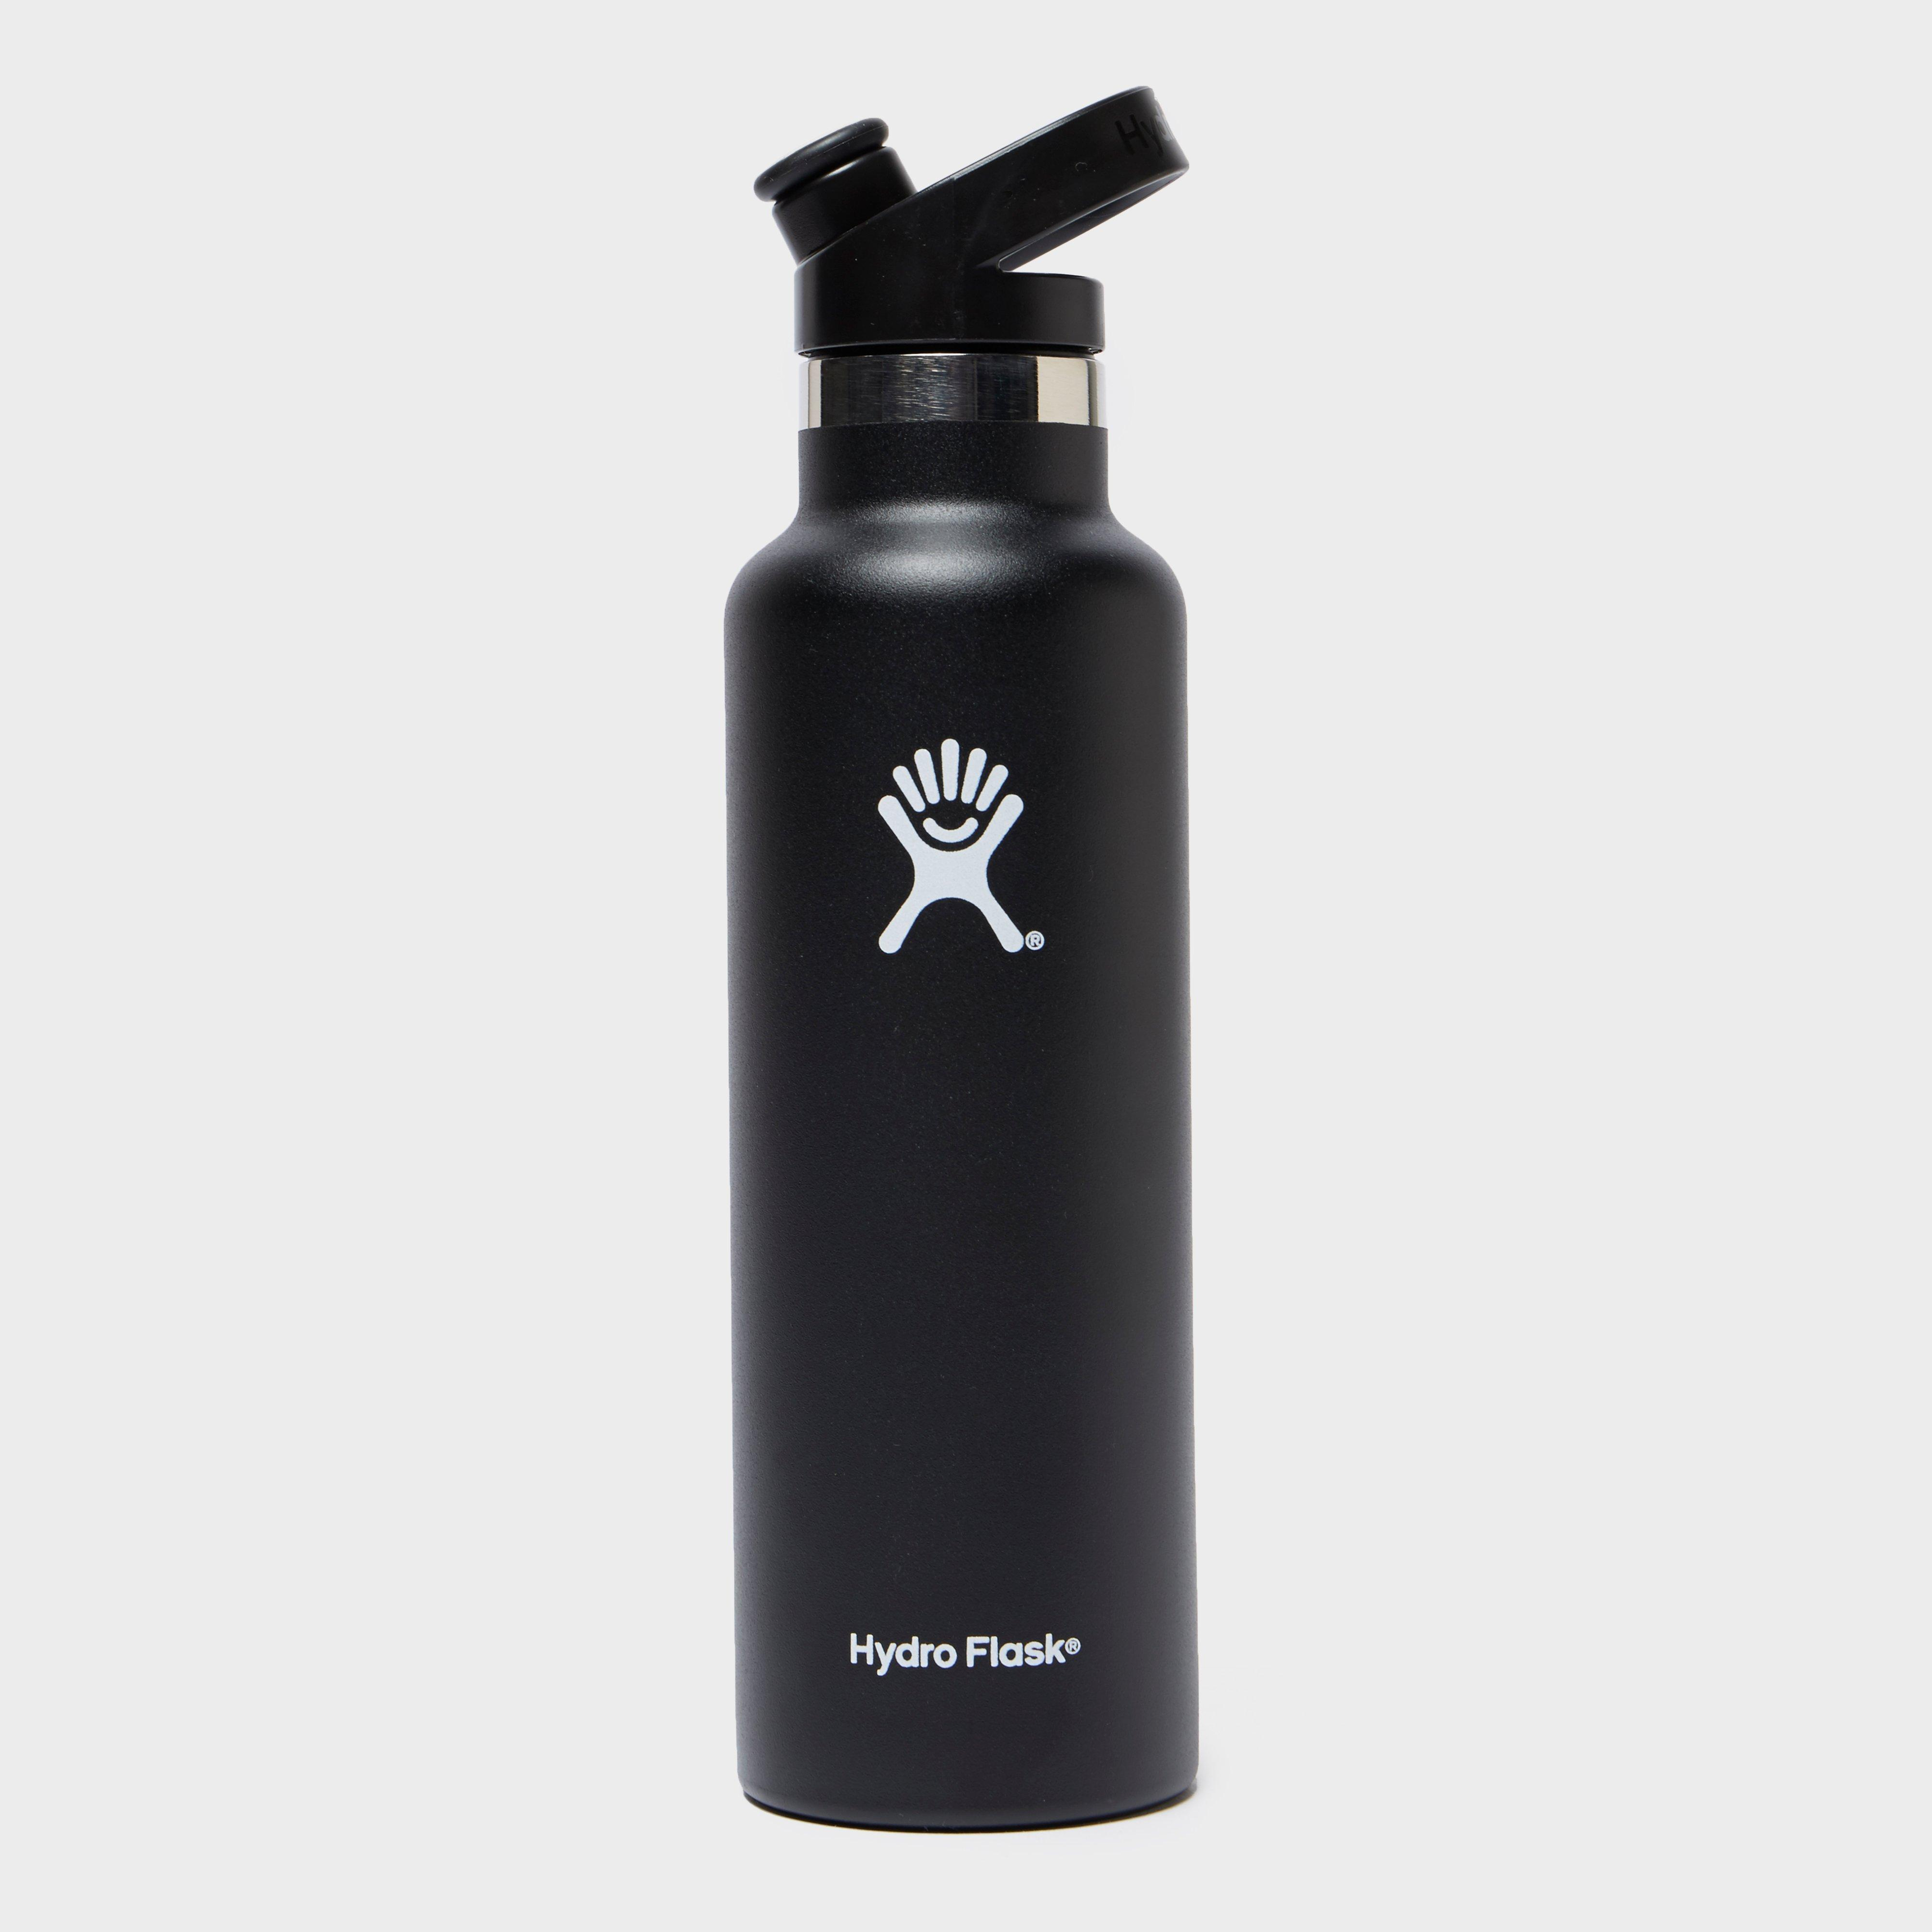 Hydro Flask 600Ml Standard Mouth Sport Cap Drinking Bottle - Black/Black, Black/BLACK